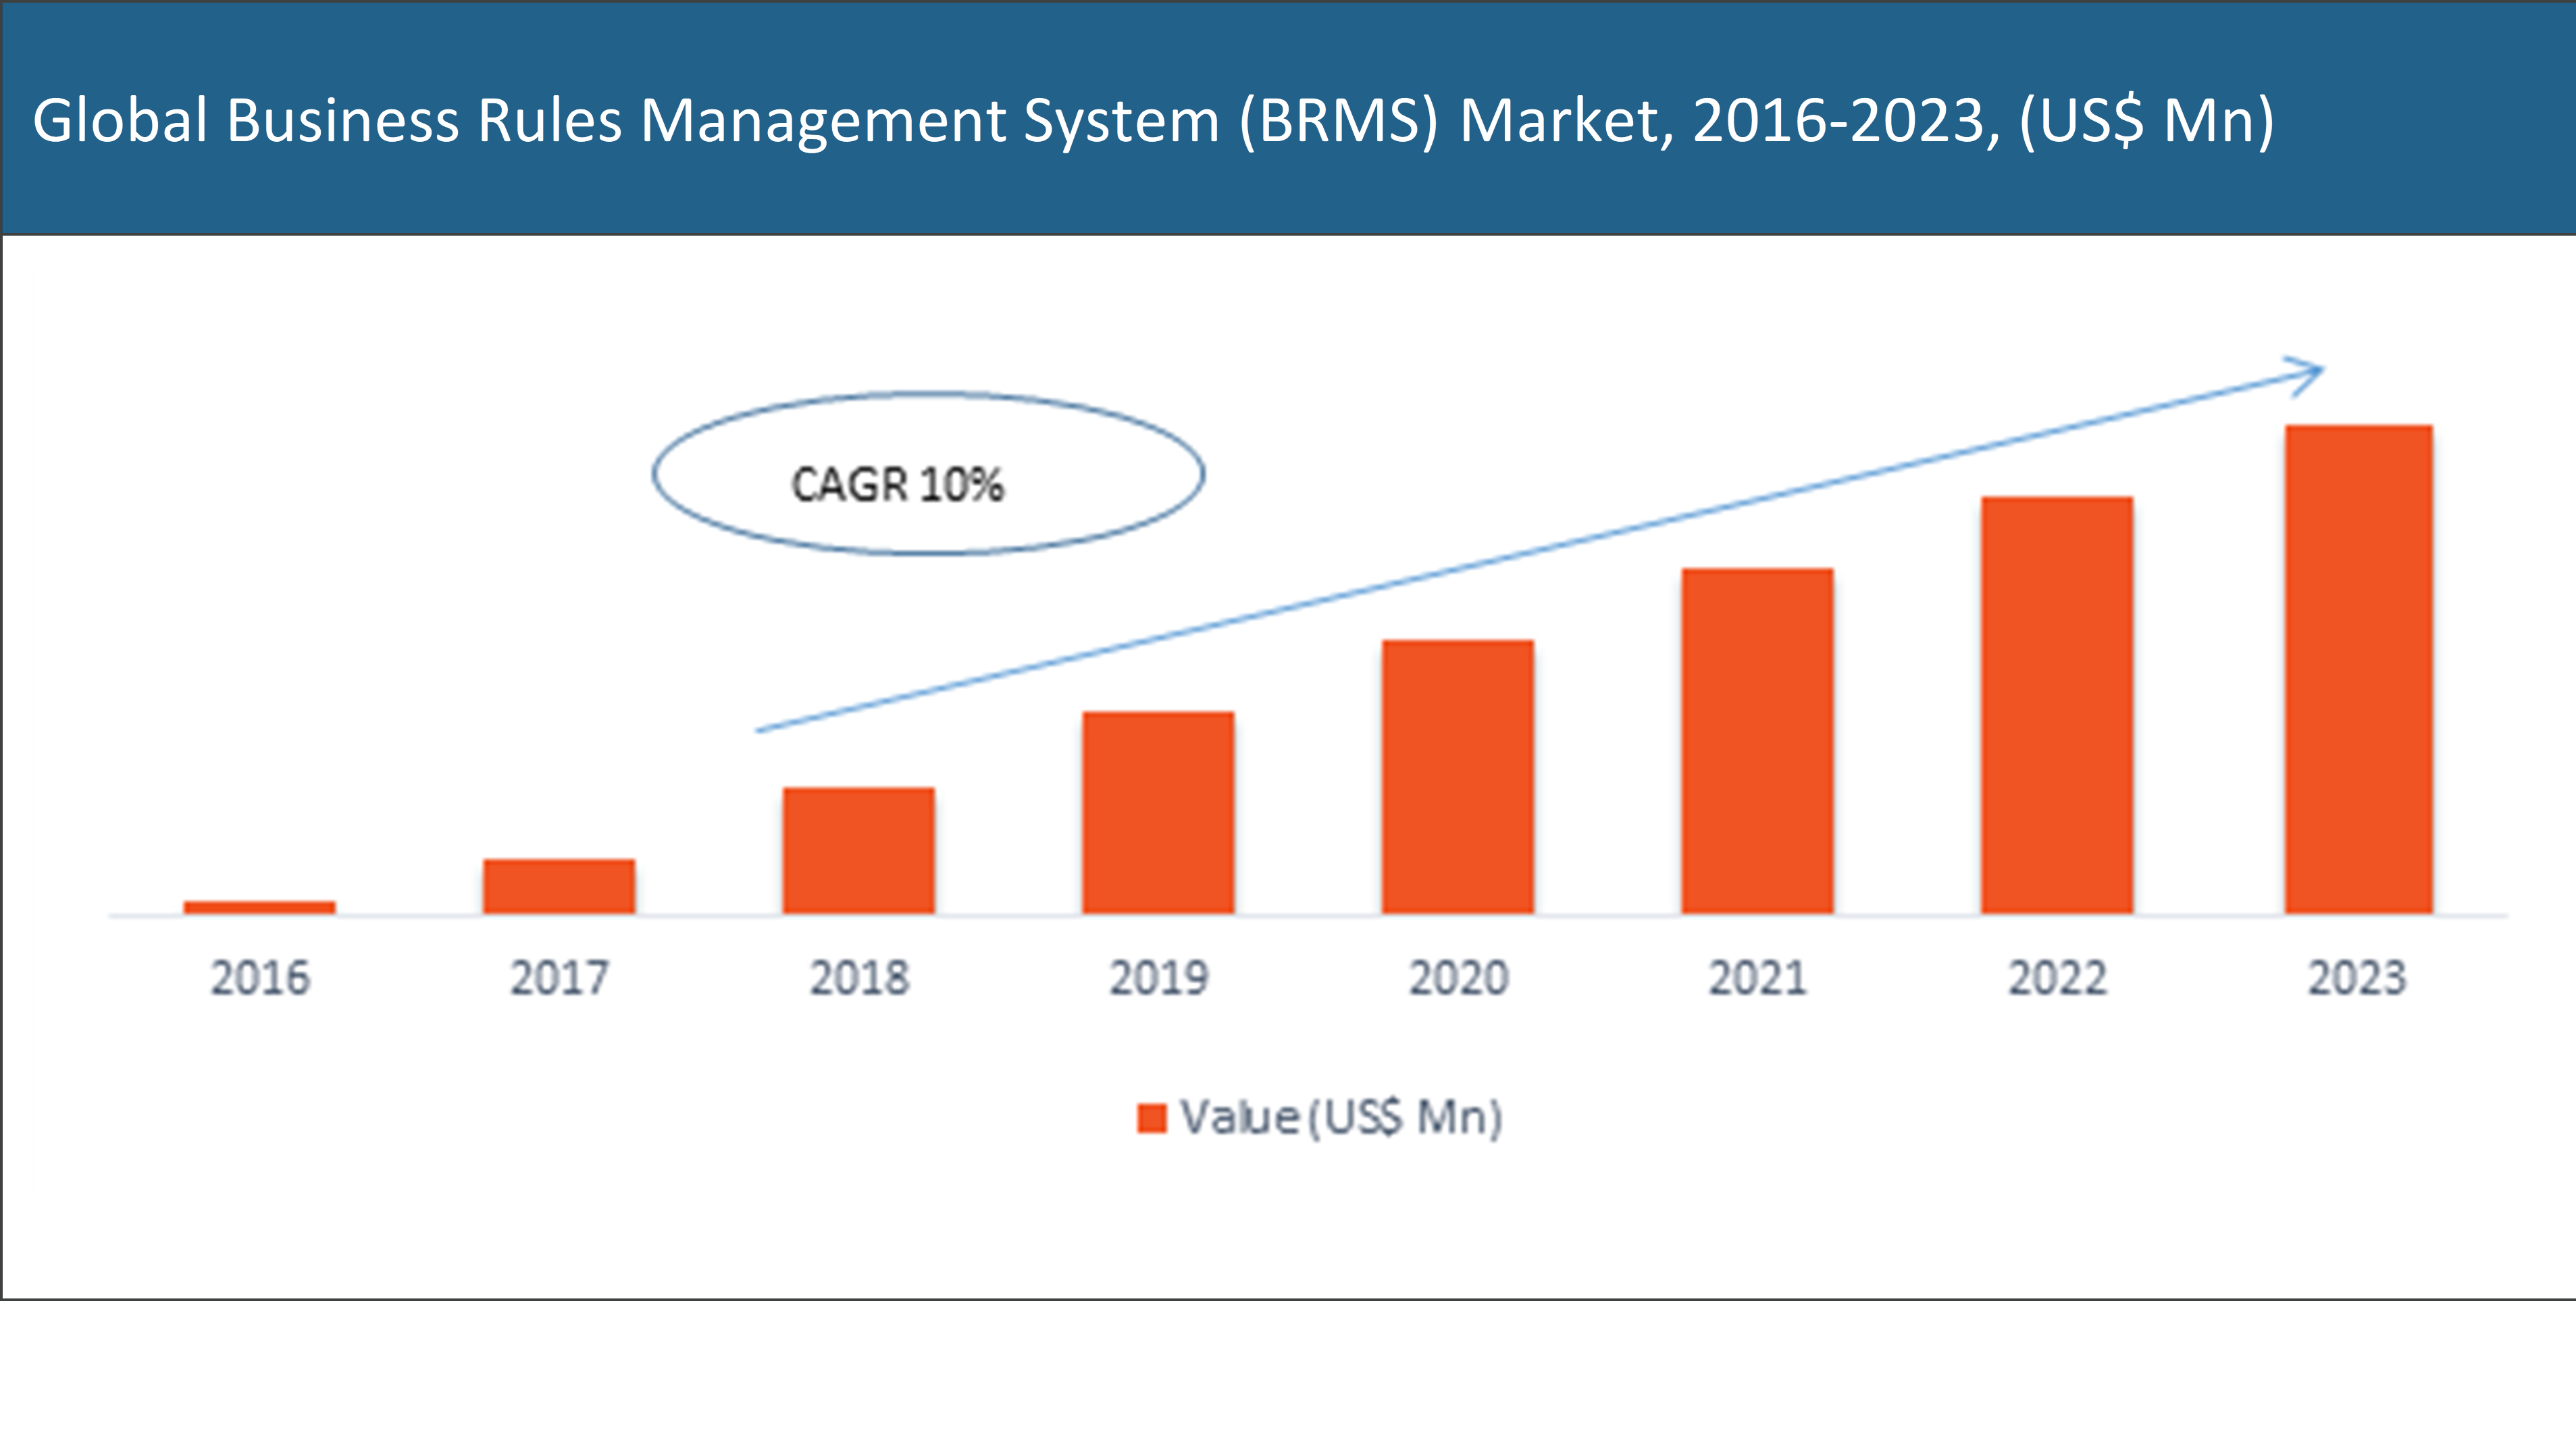 Global Business Rules Management System (BRMS) Market